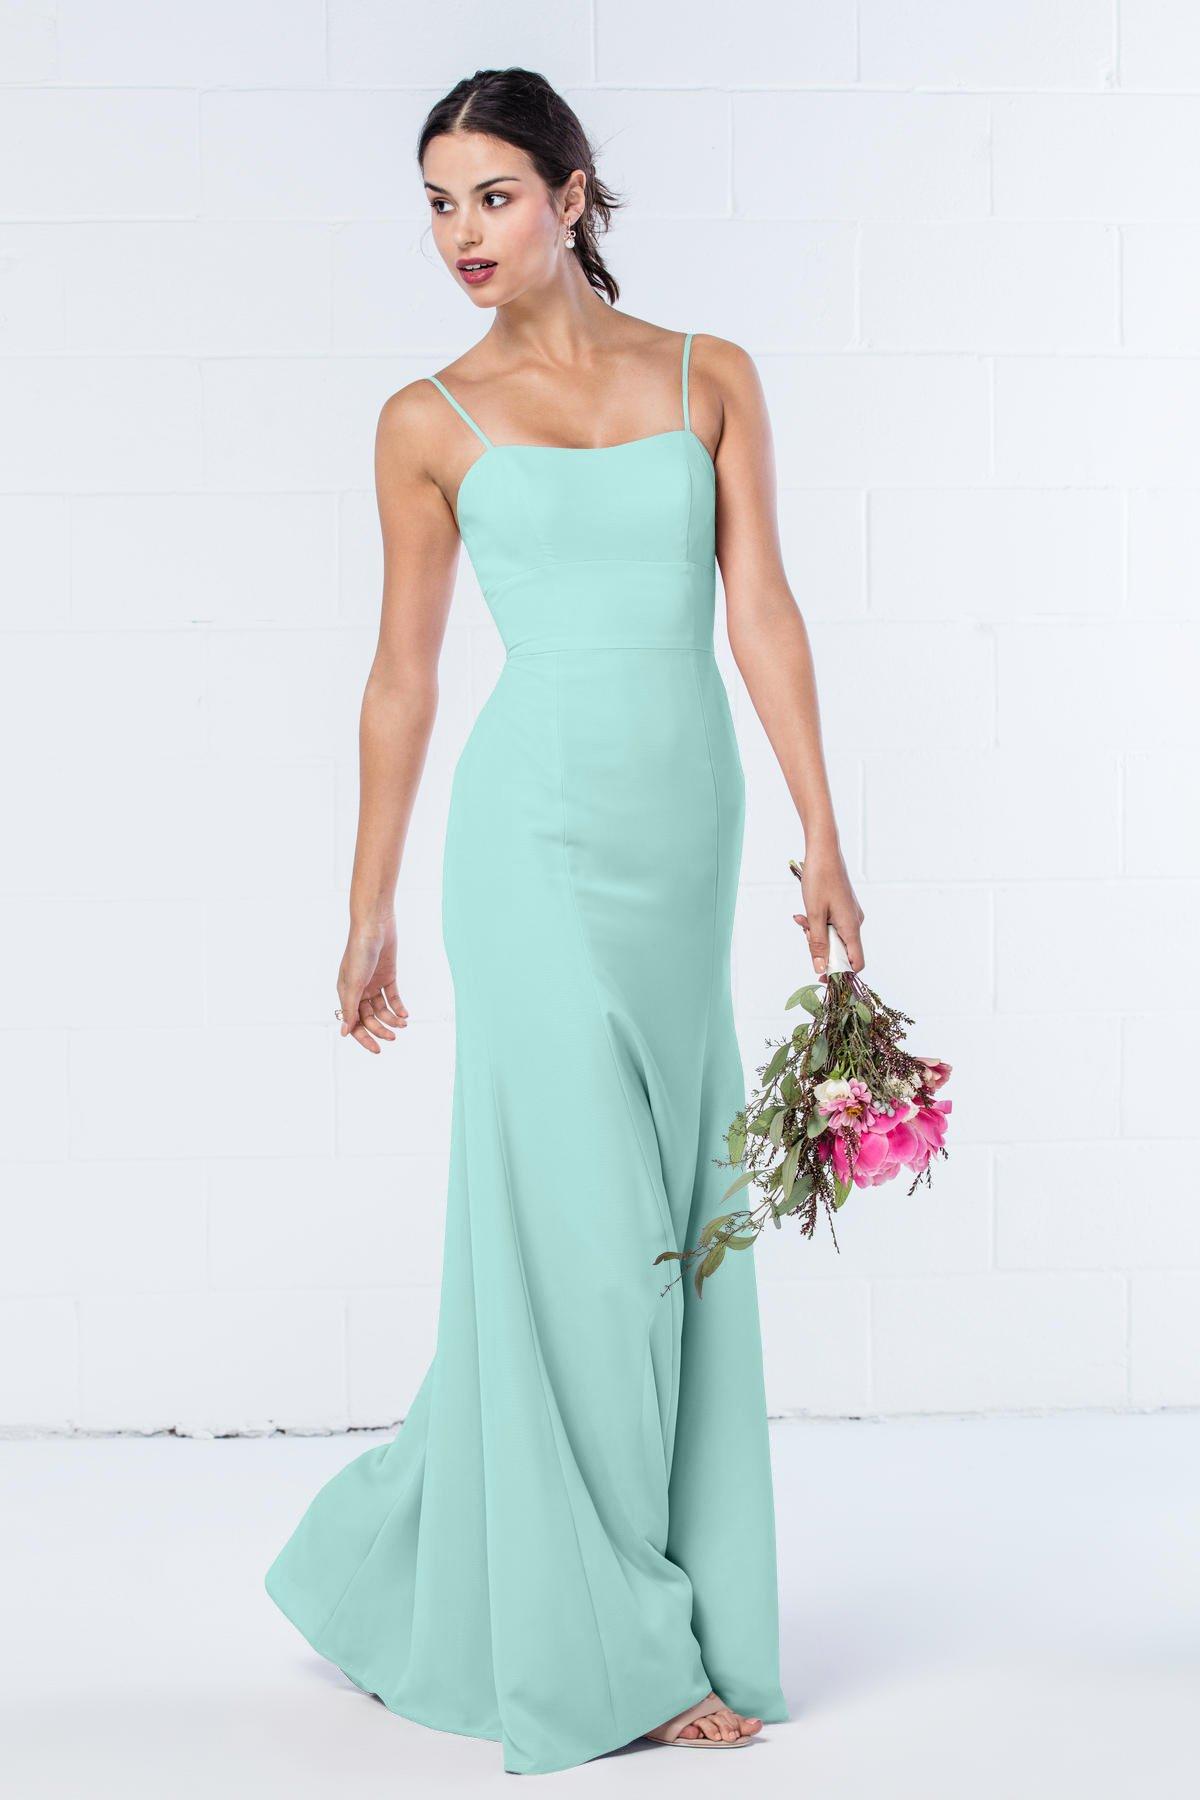 Mint Green Simple Long Bridesmaid Dress